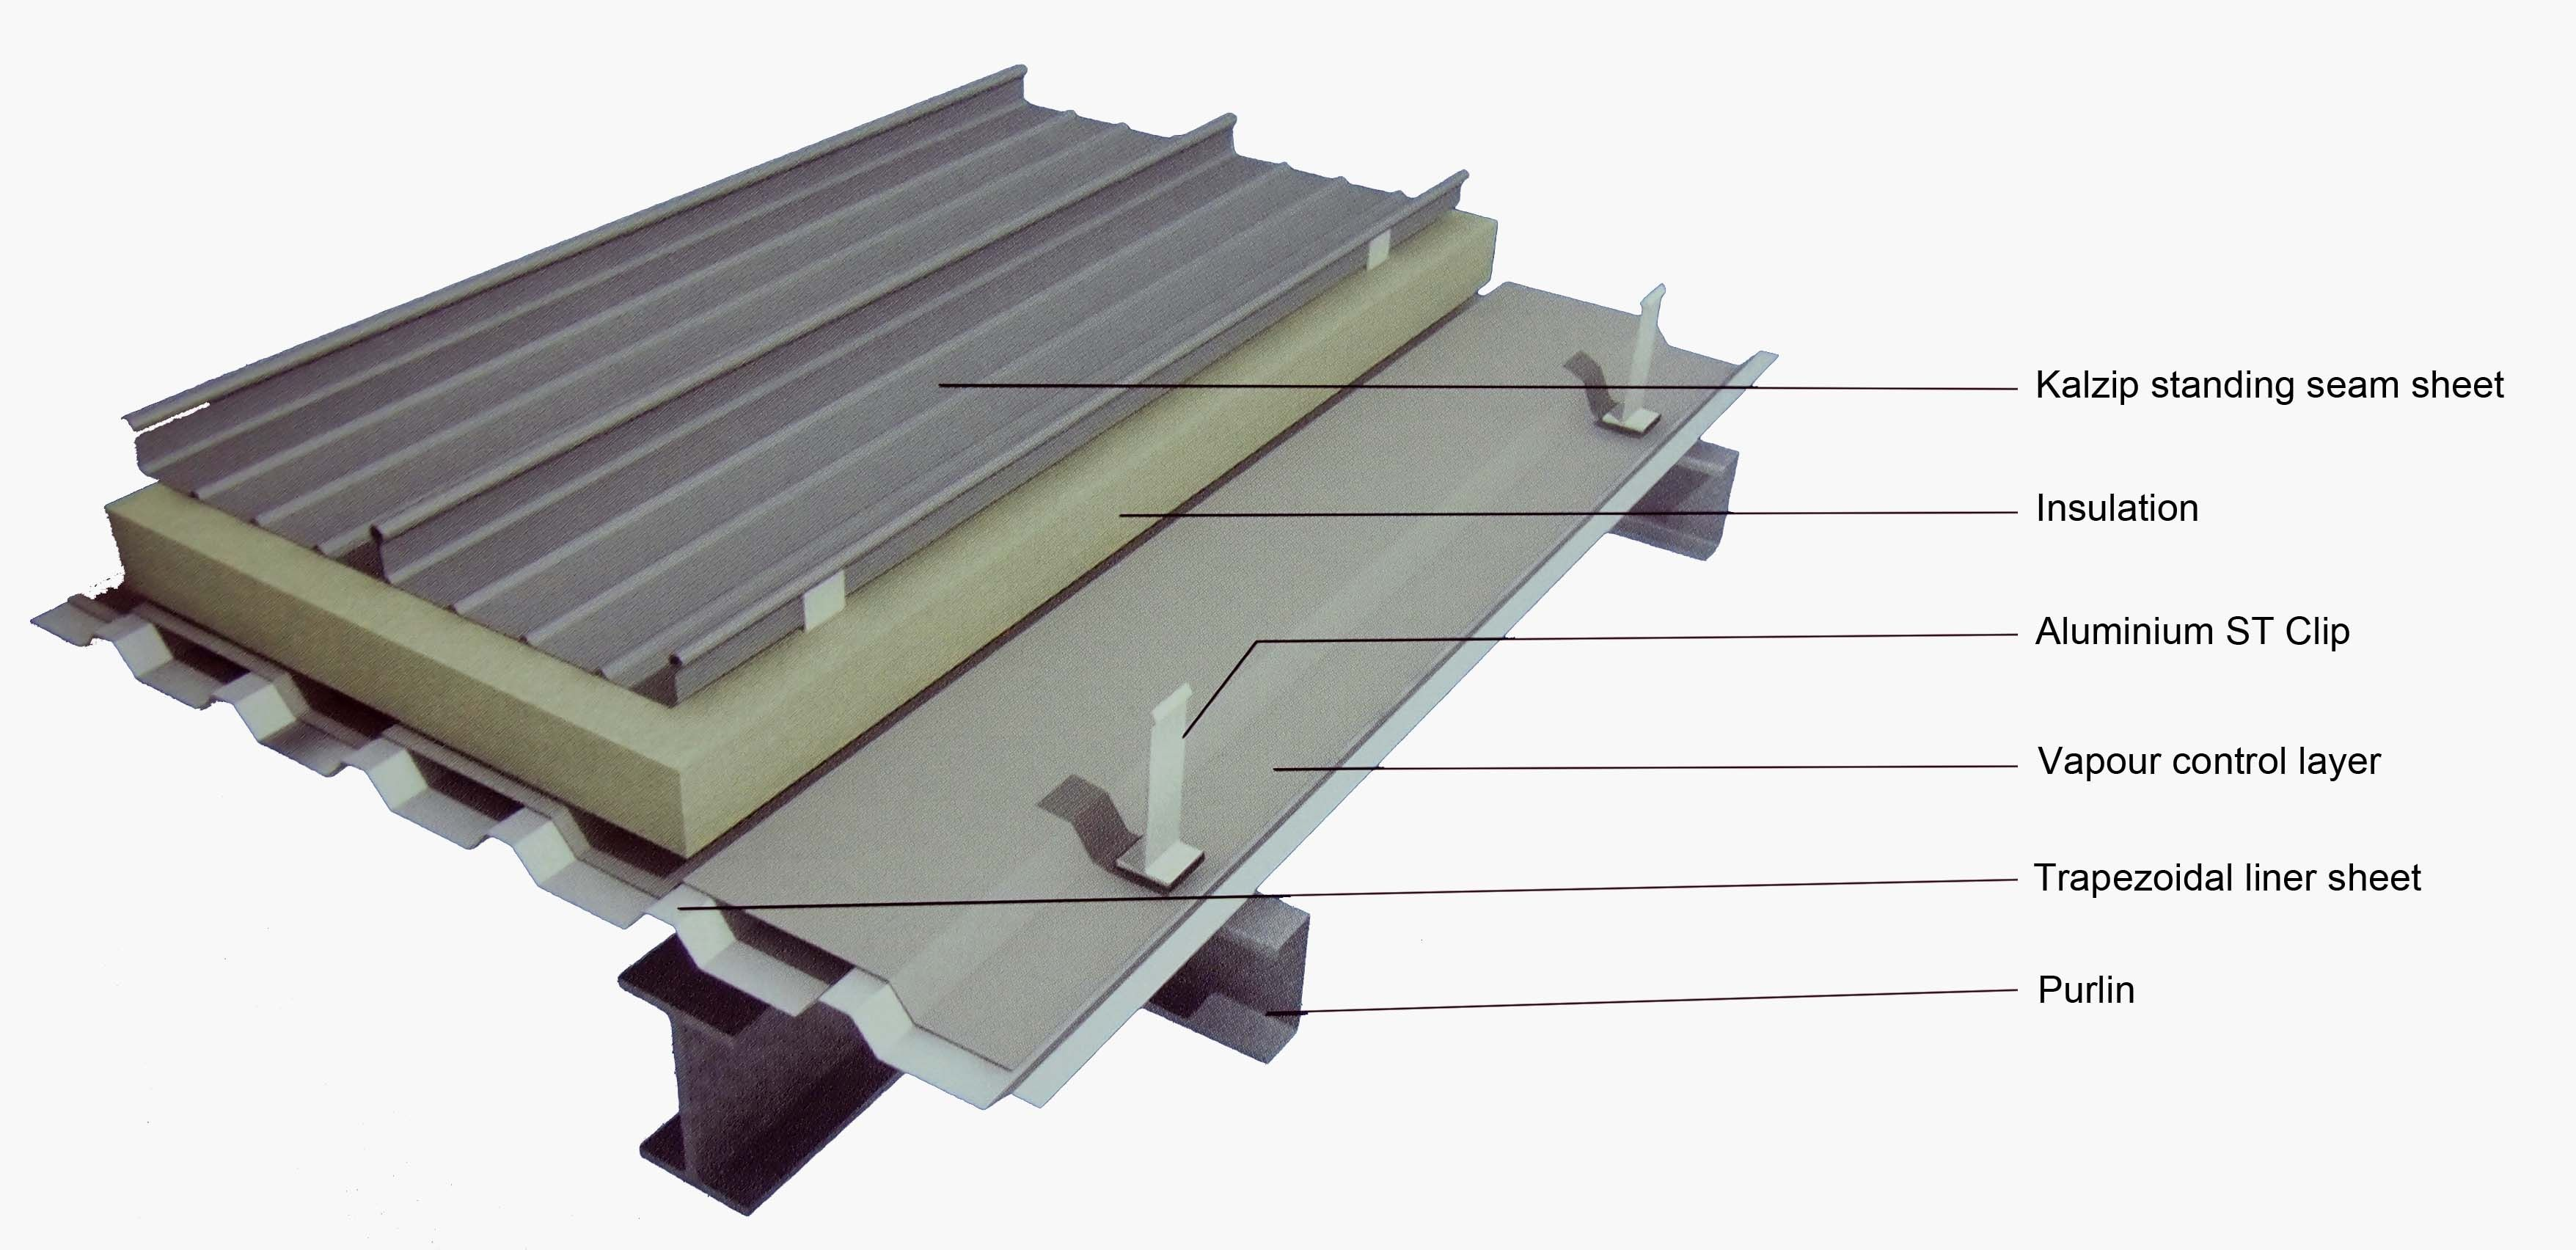 Ideas Insulation Blanket Under Metal Roof Insulation Blanket Under Metal Roof Flat Metal Ro Metal Roof Panels Metal Roof Construction Standing Seam Metal Roof